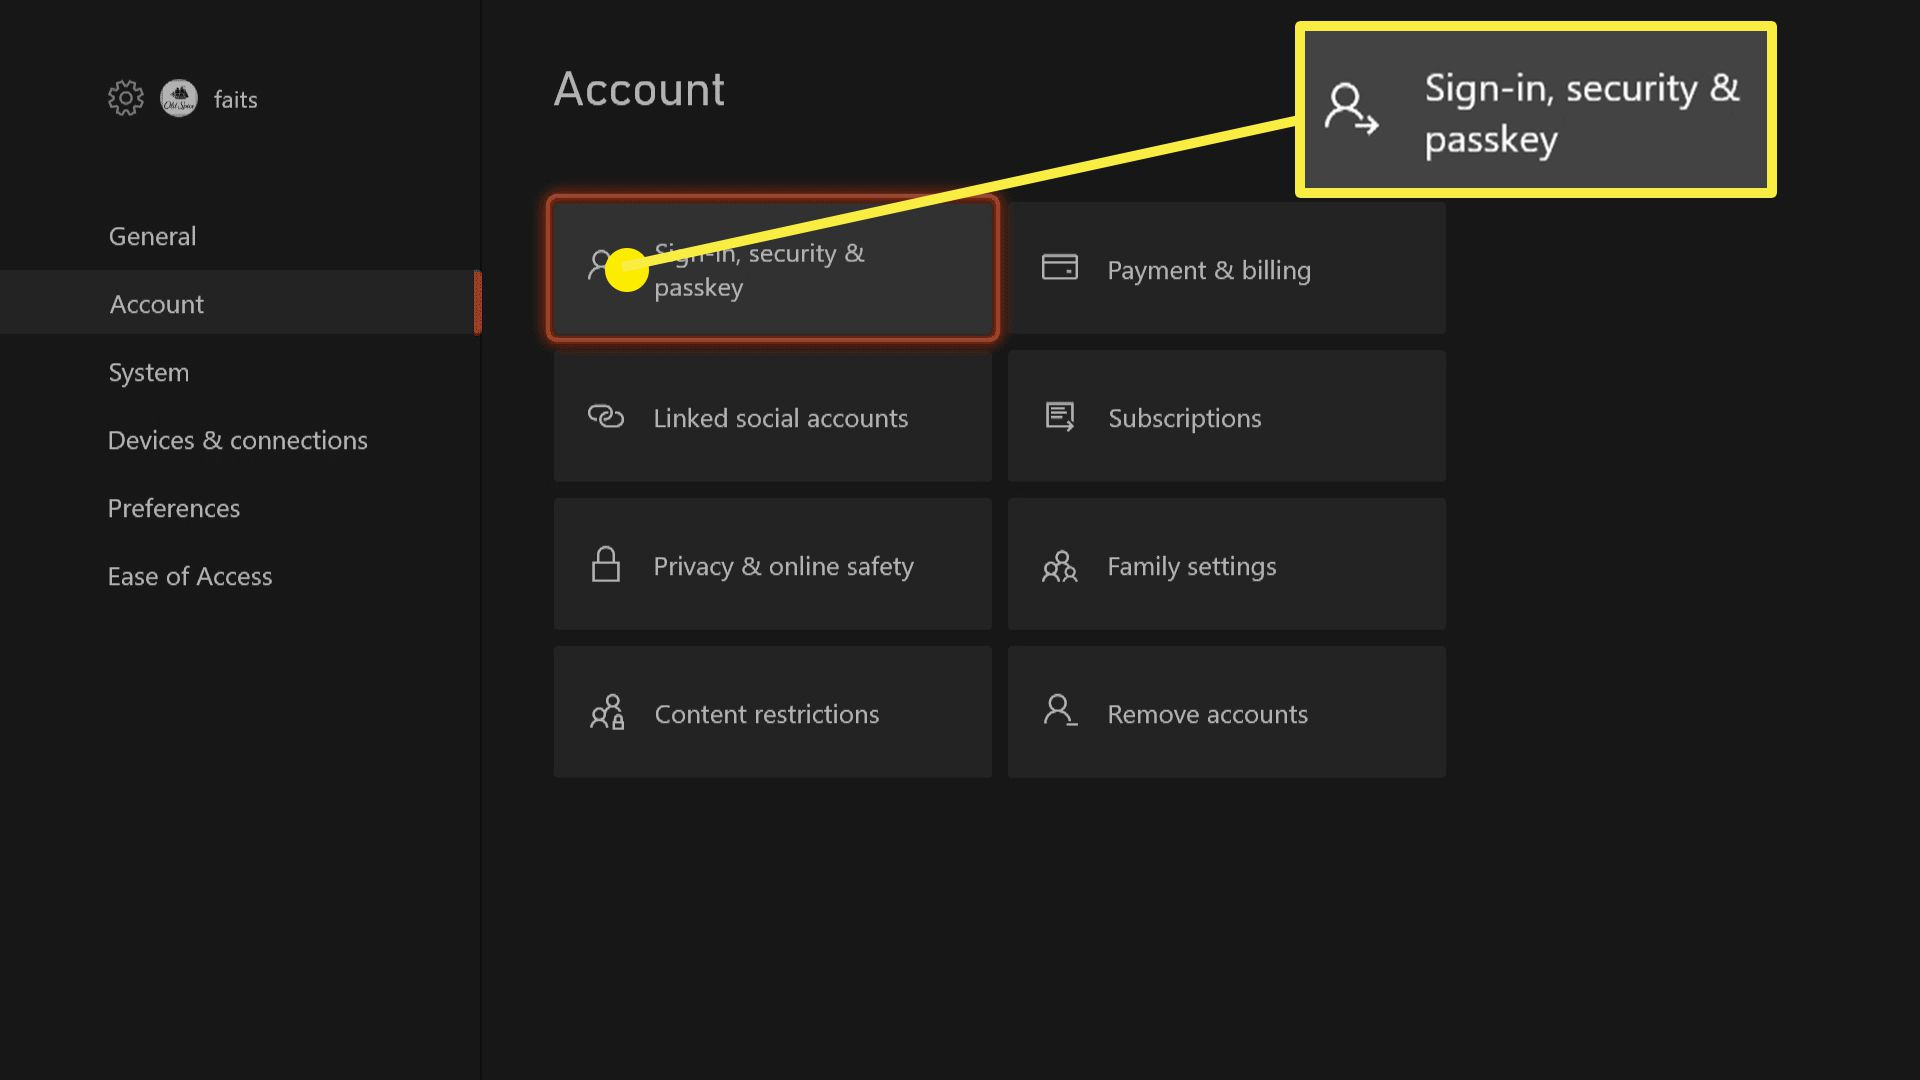 The account menu on Xbox Series X|S.